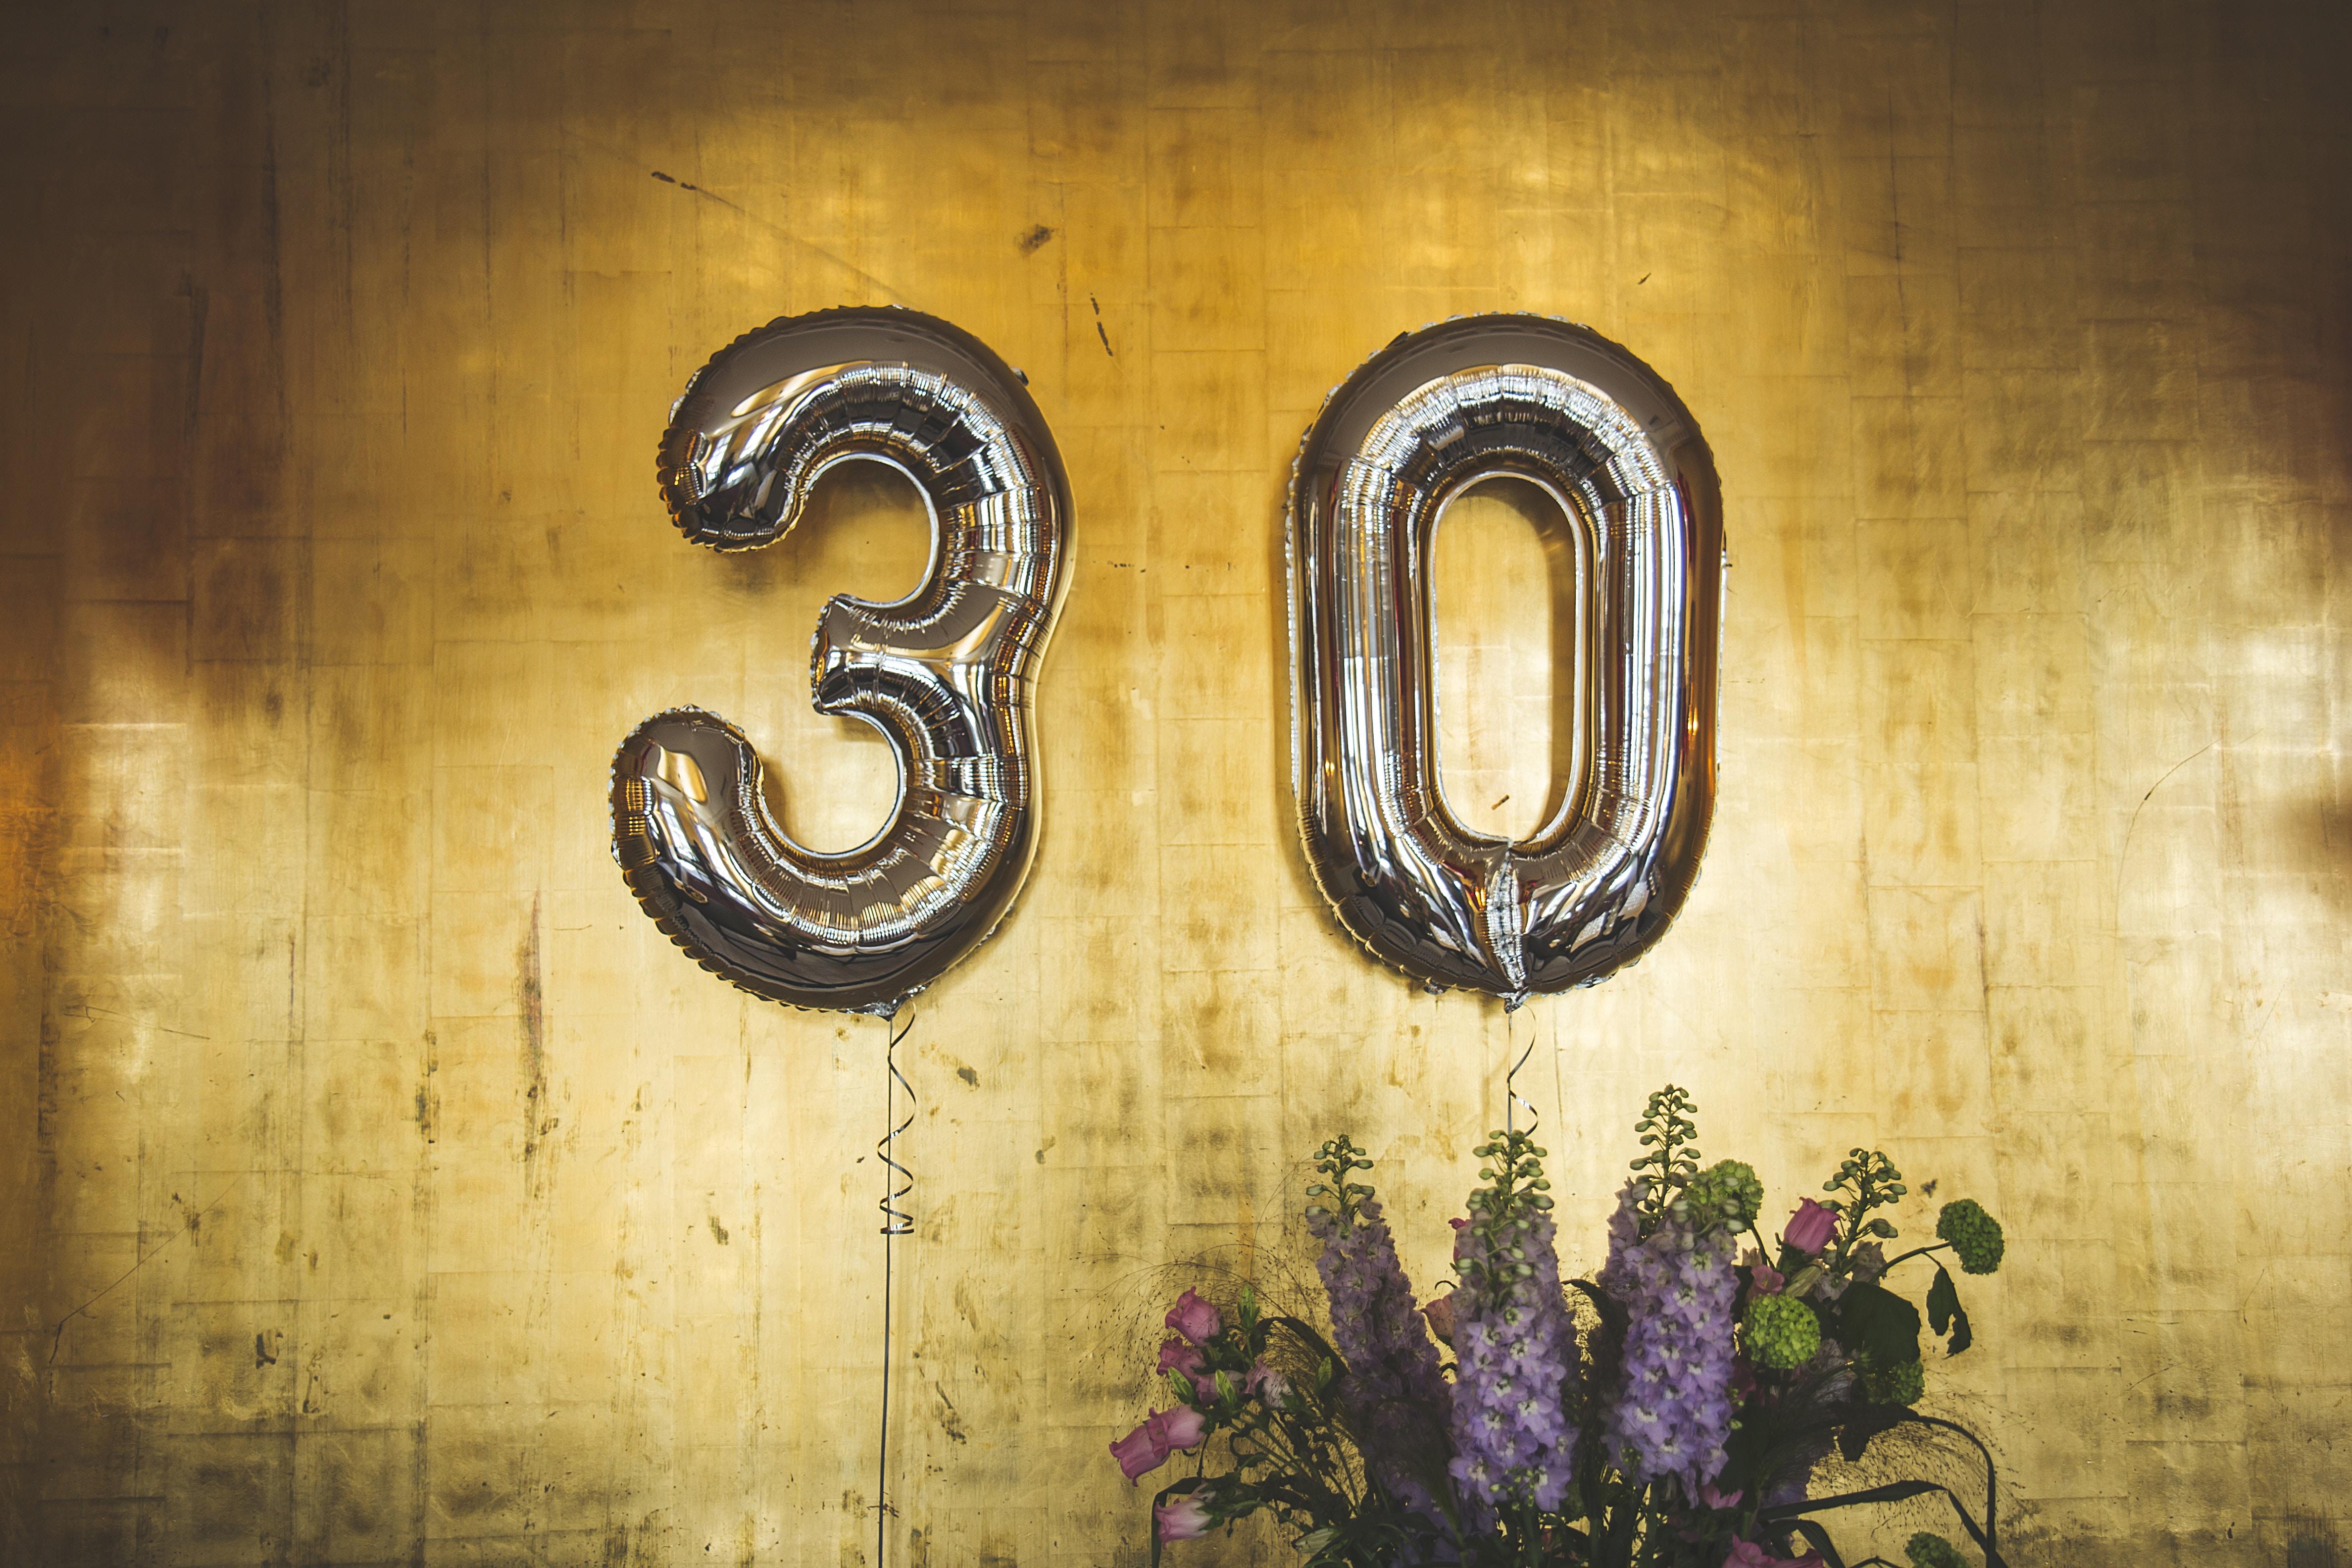 30 ans, décennie, vieillir